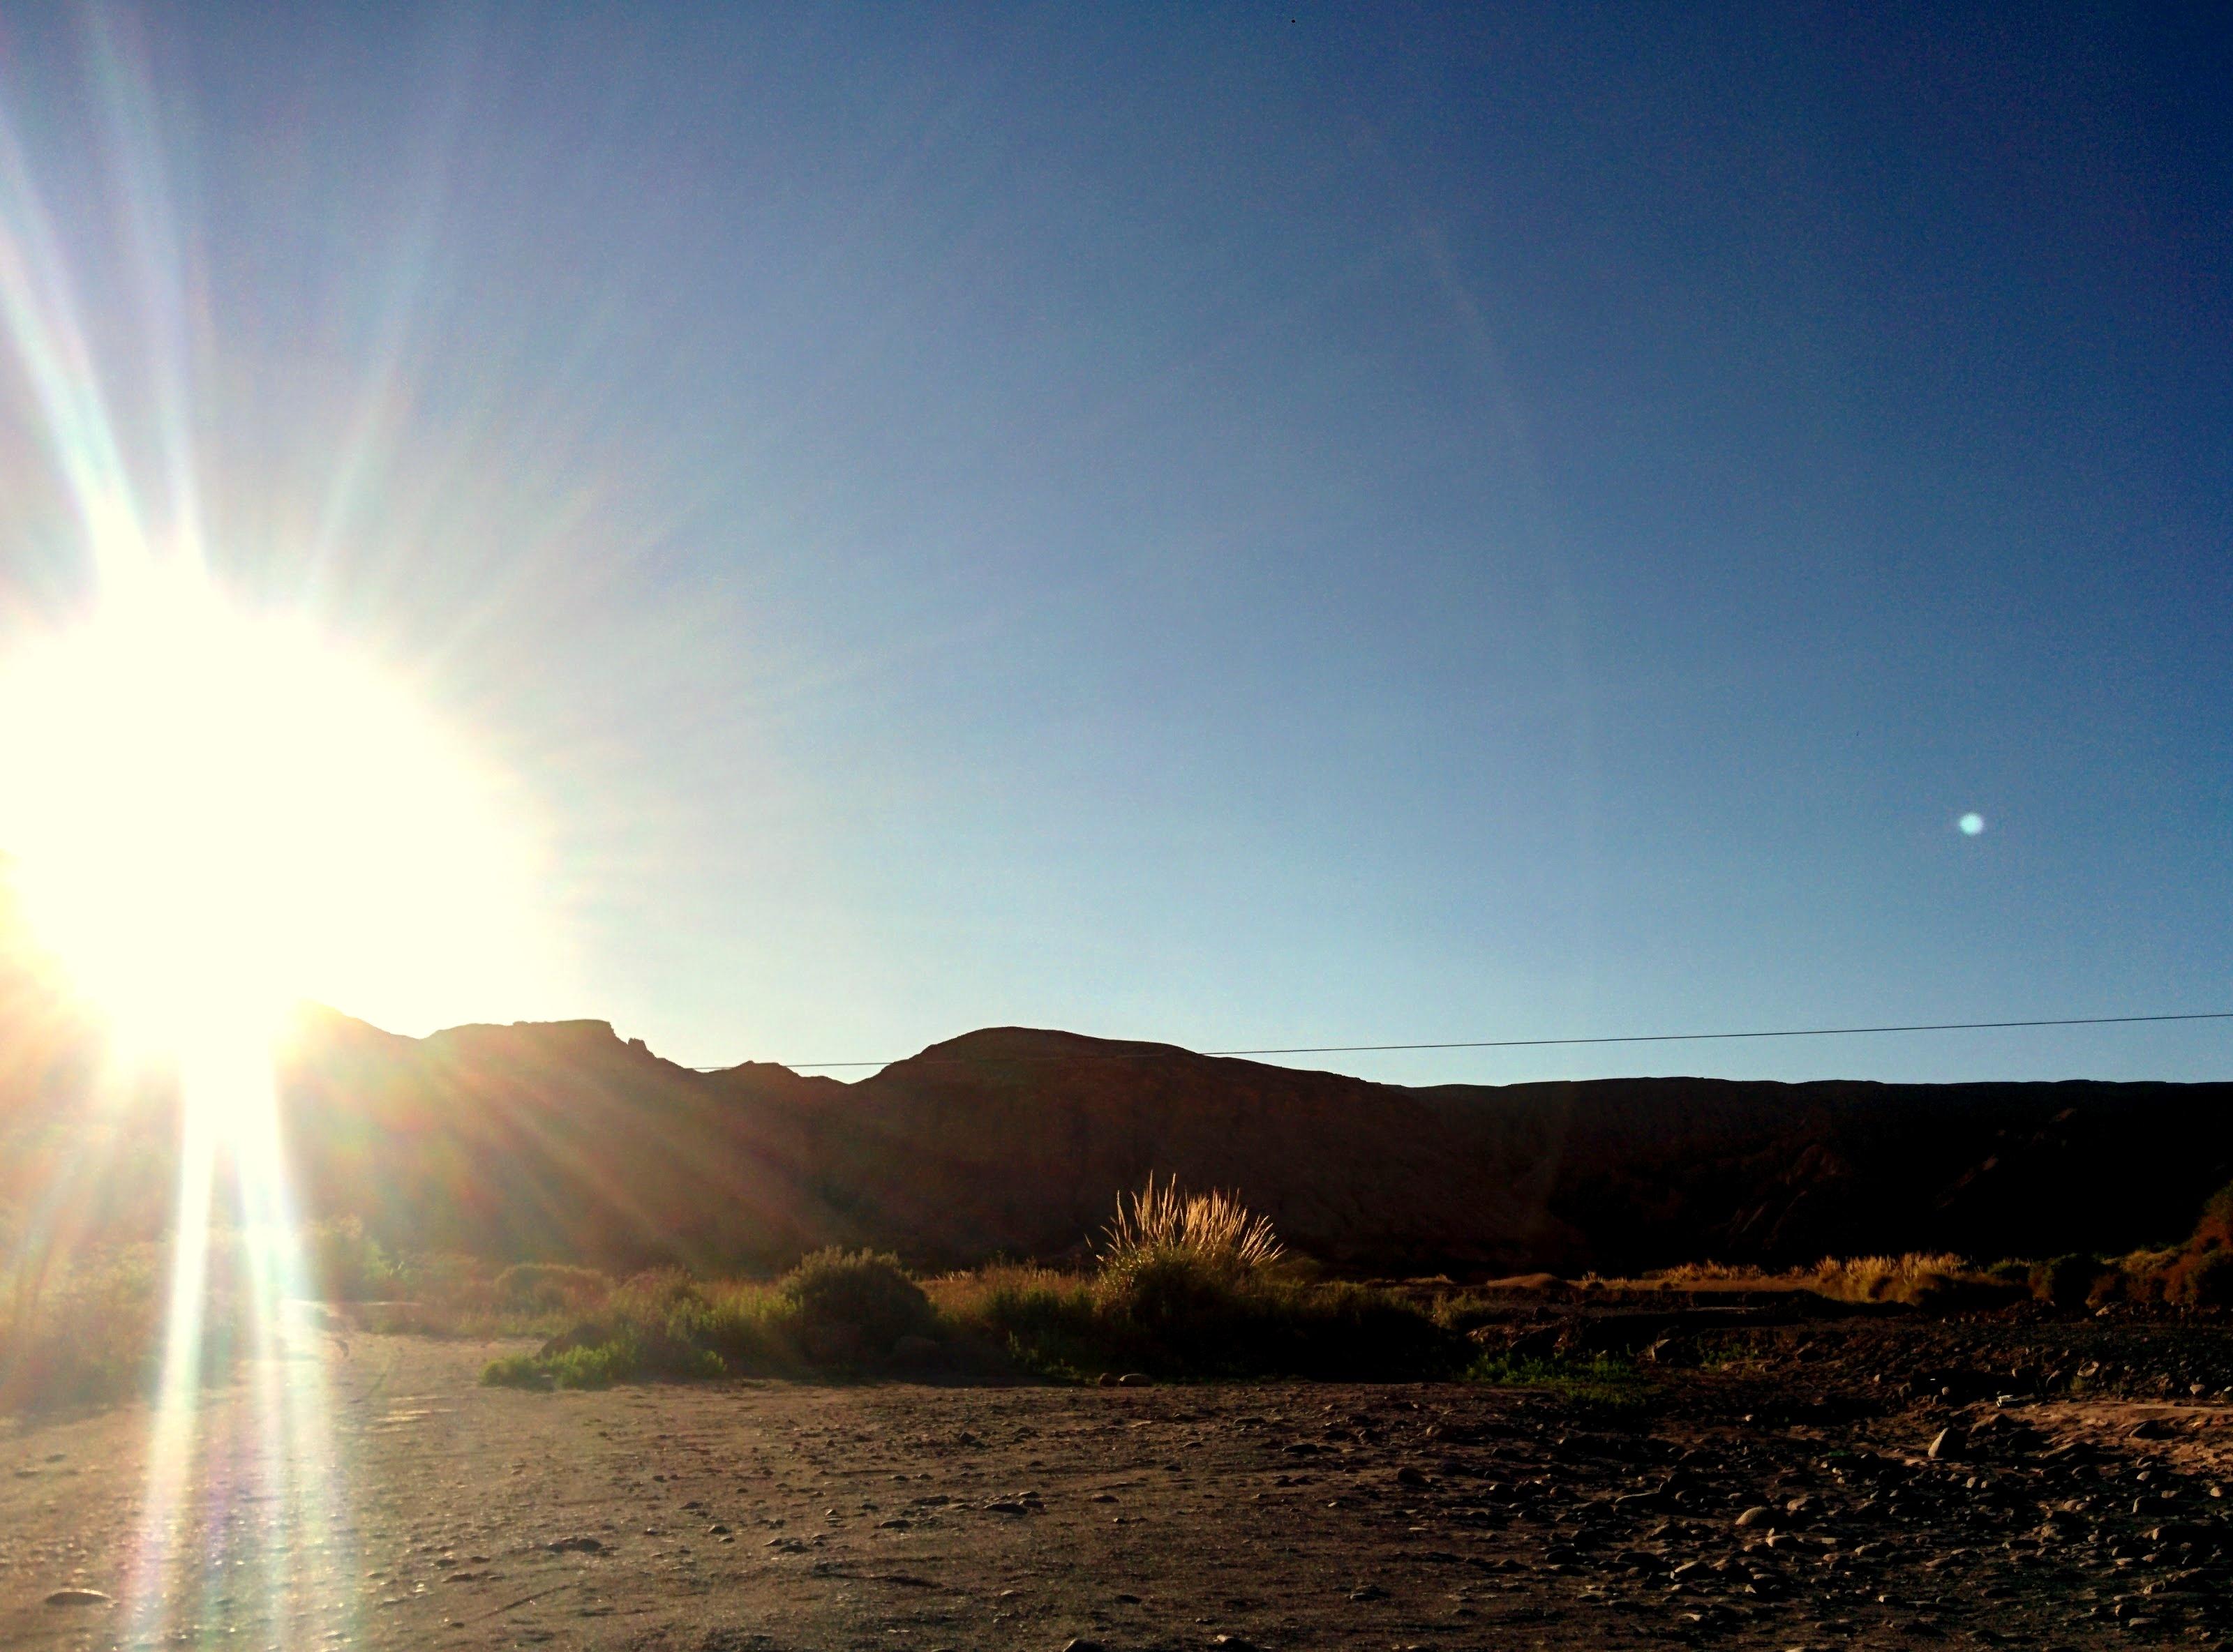 Arredores de San Pedro de Atacama 06